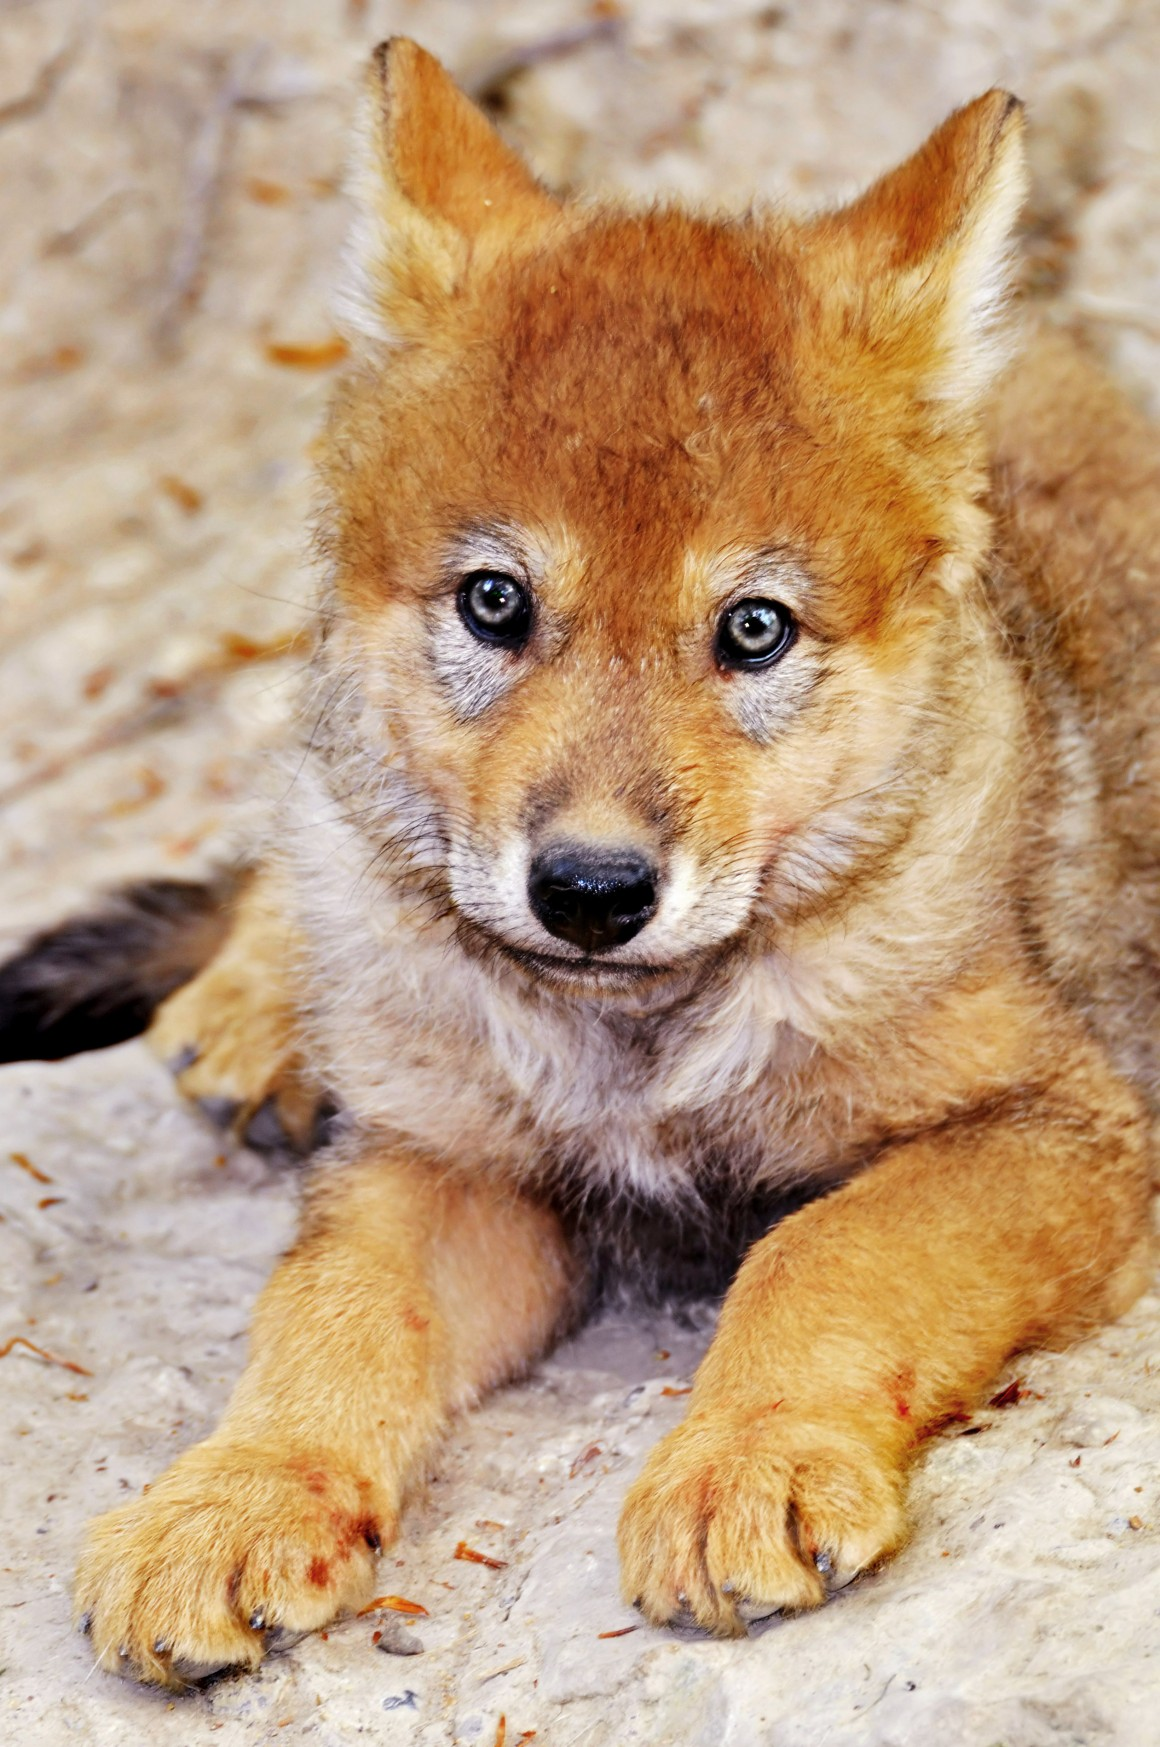 Les petits loups, un conte de Raymonde Verney